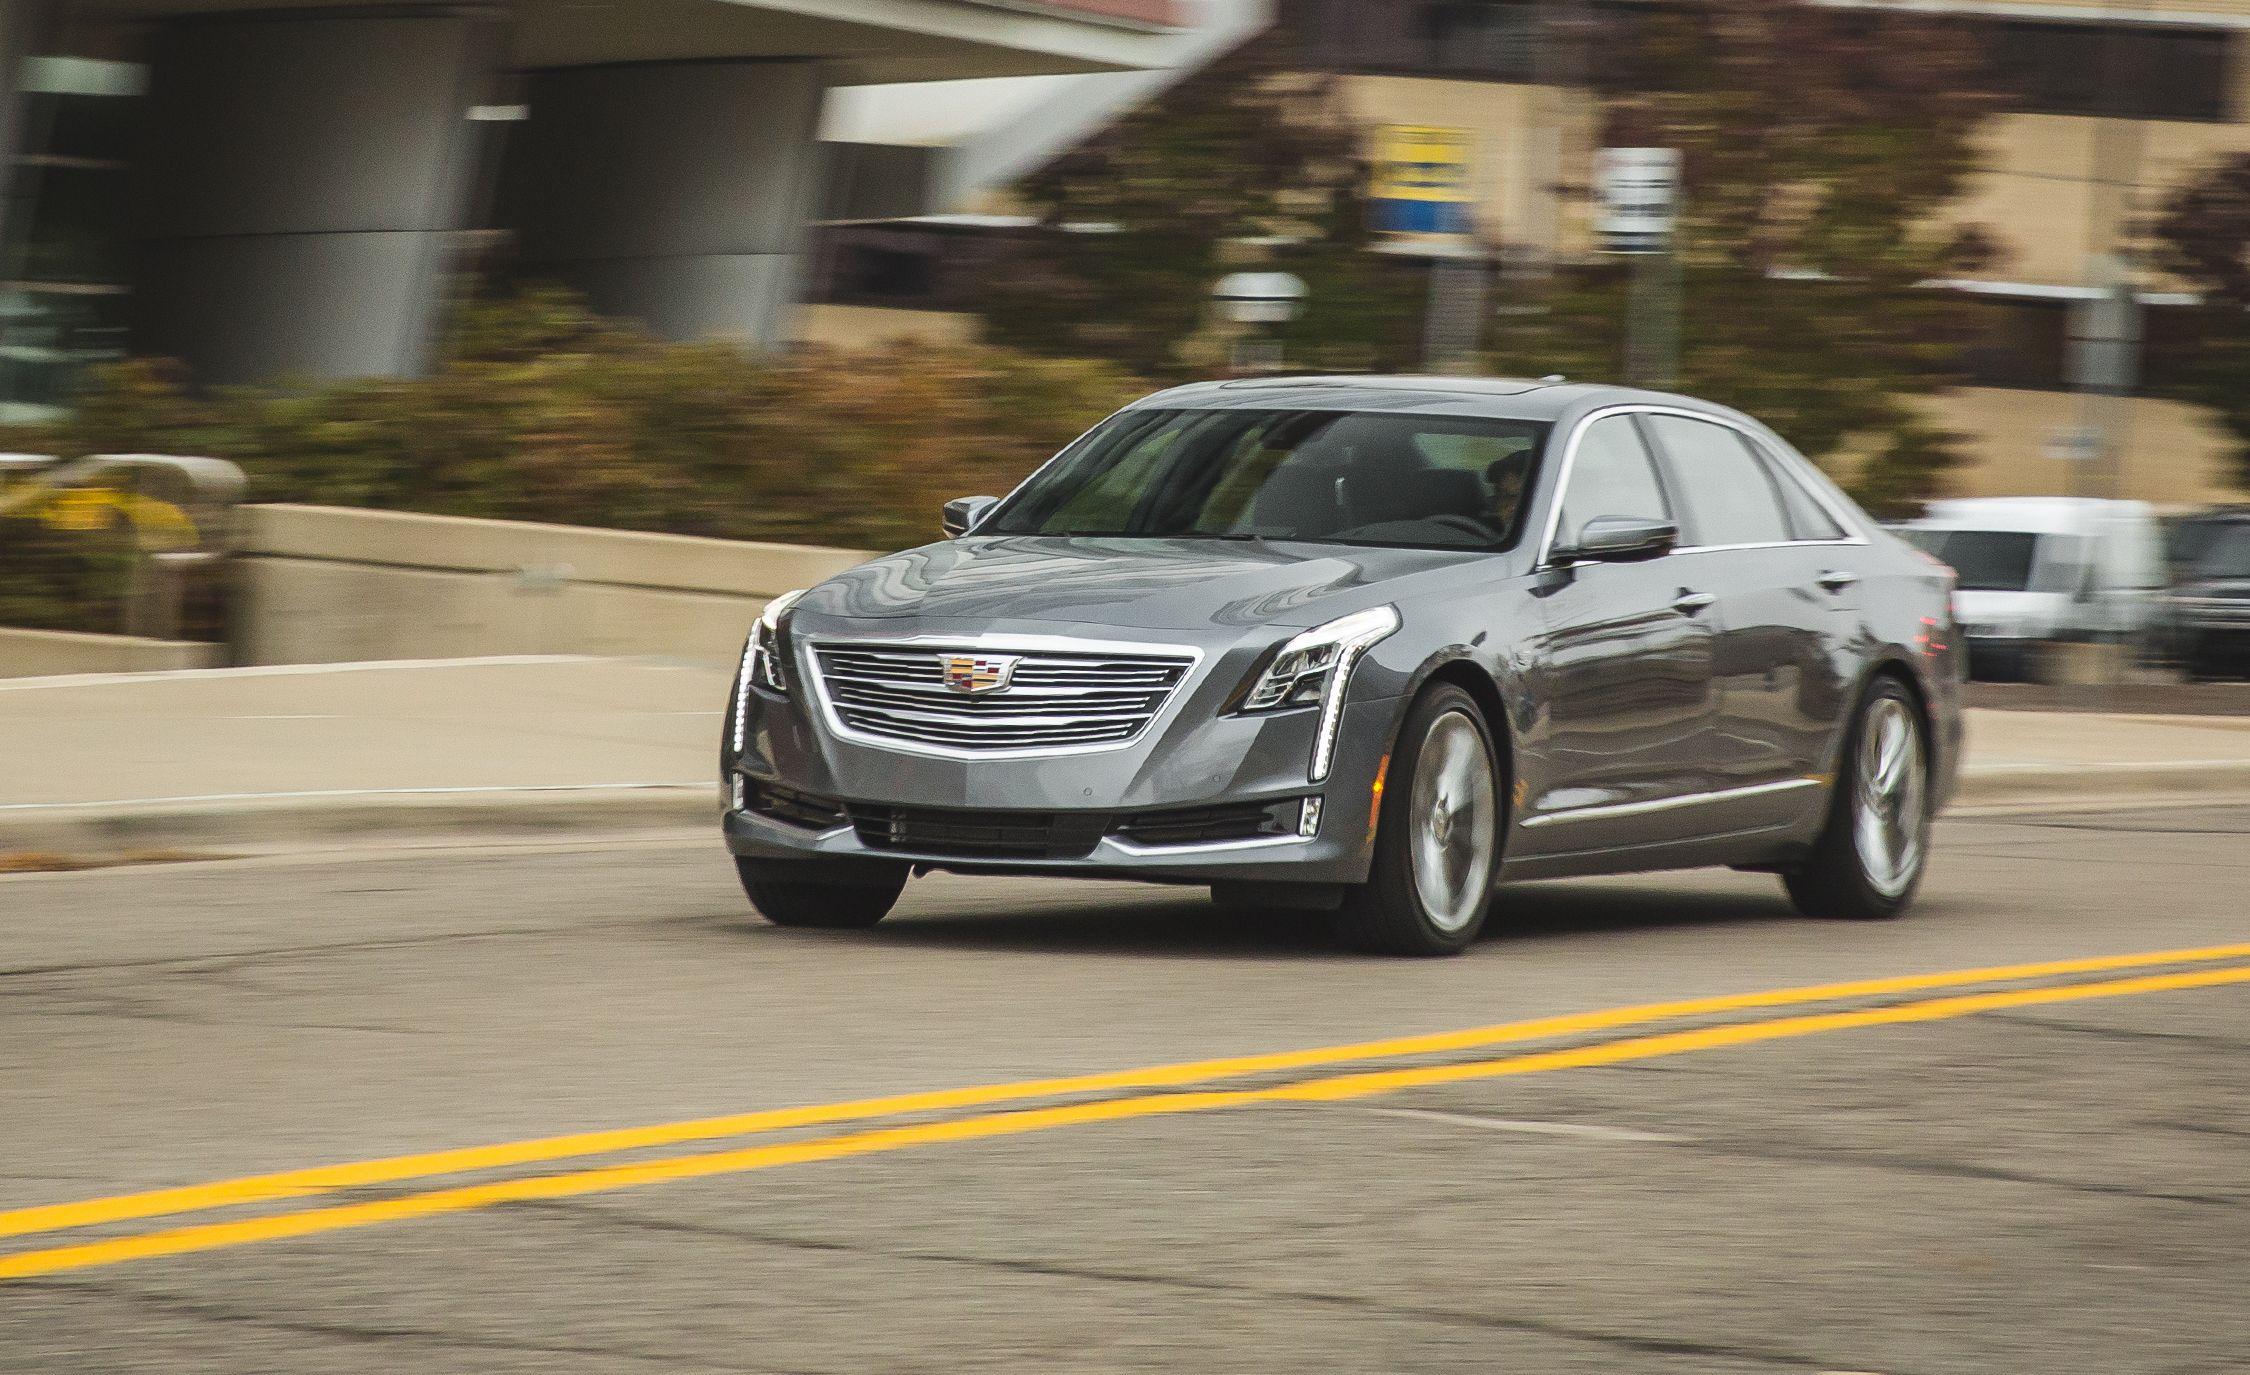 Cadillac CT6 Reviews | Cadillac CT6 Price, Photos, and Specs | Car